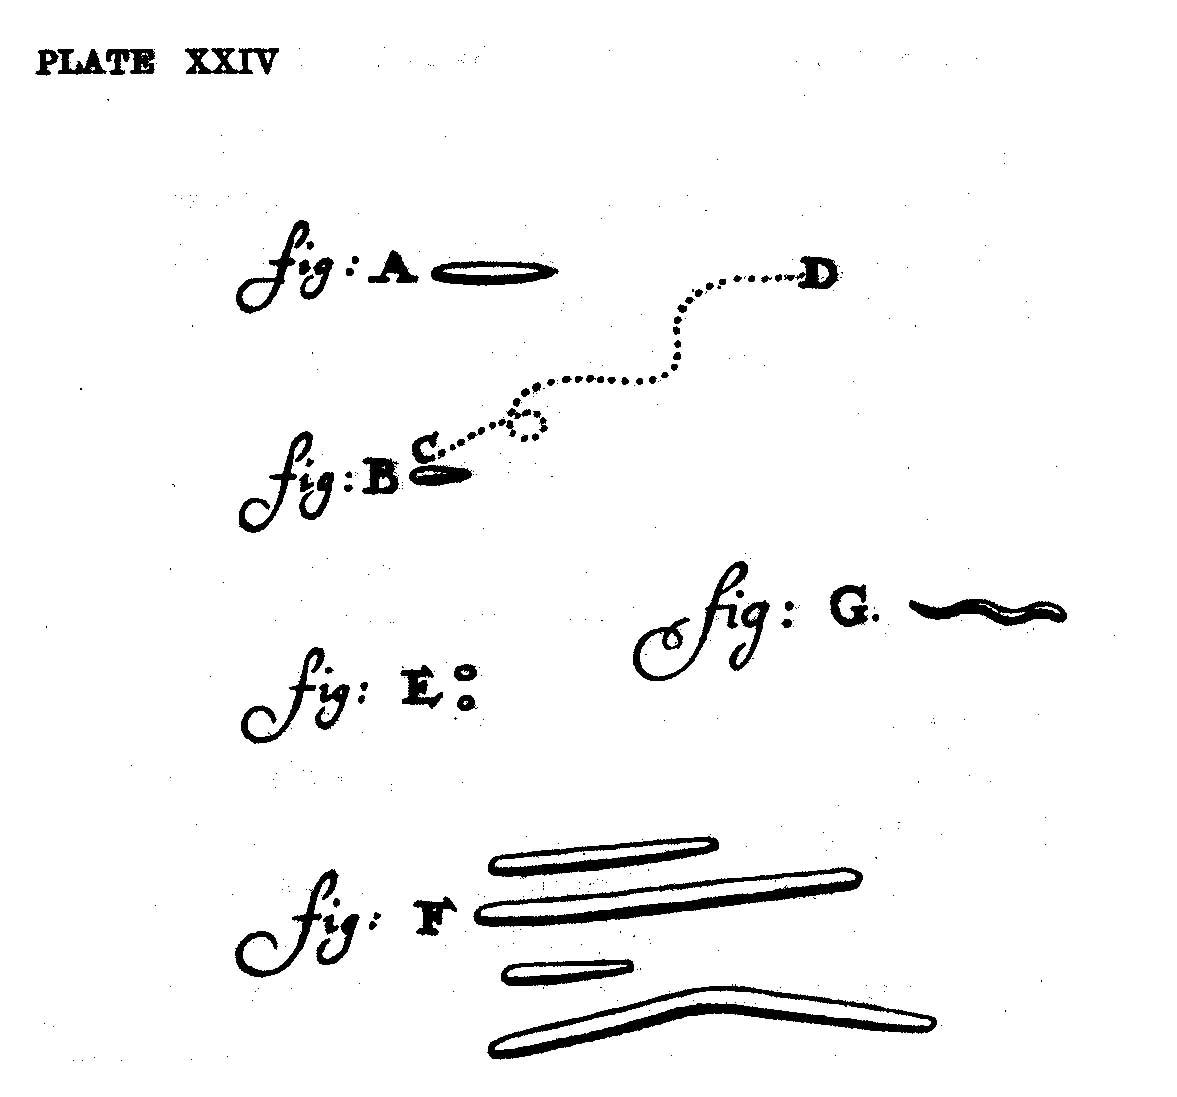 van Leeuwenhoeks teckningar av 'små djur' (animalcules).